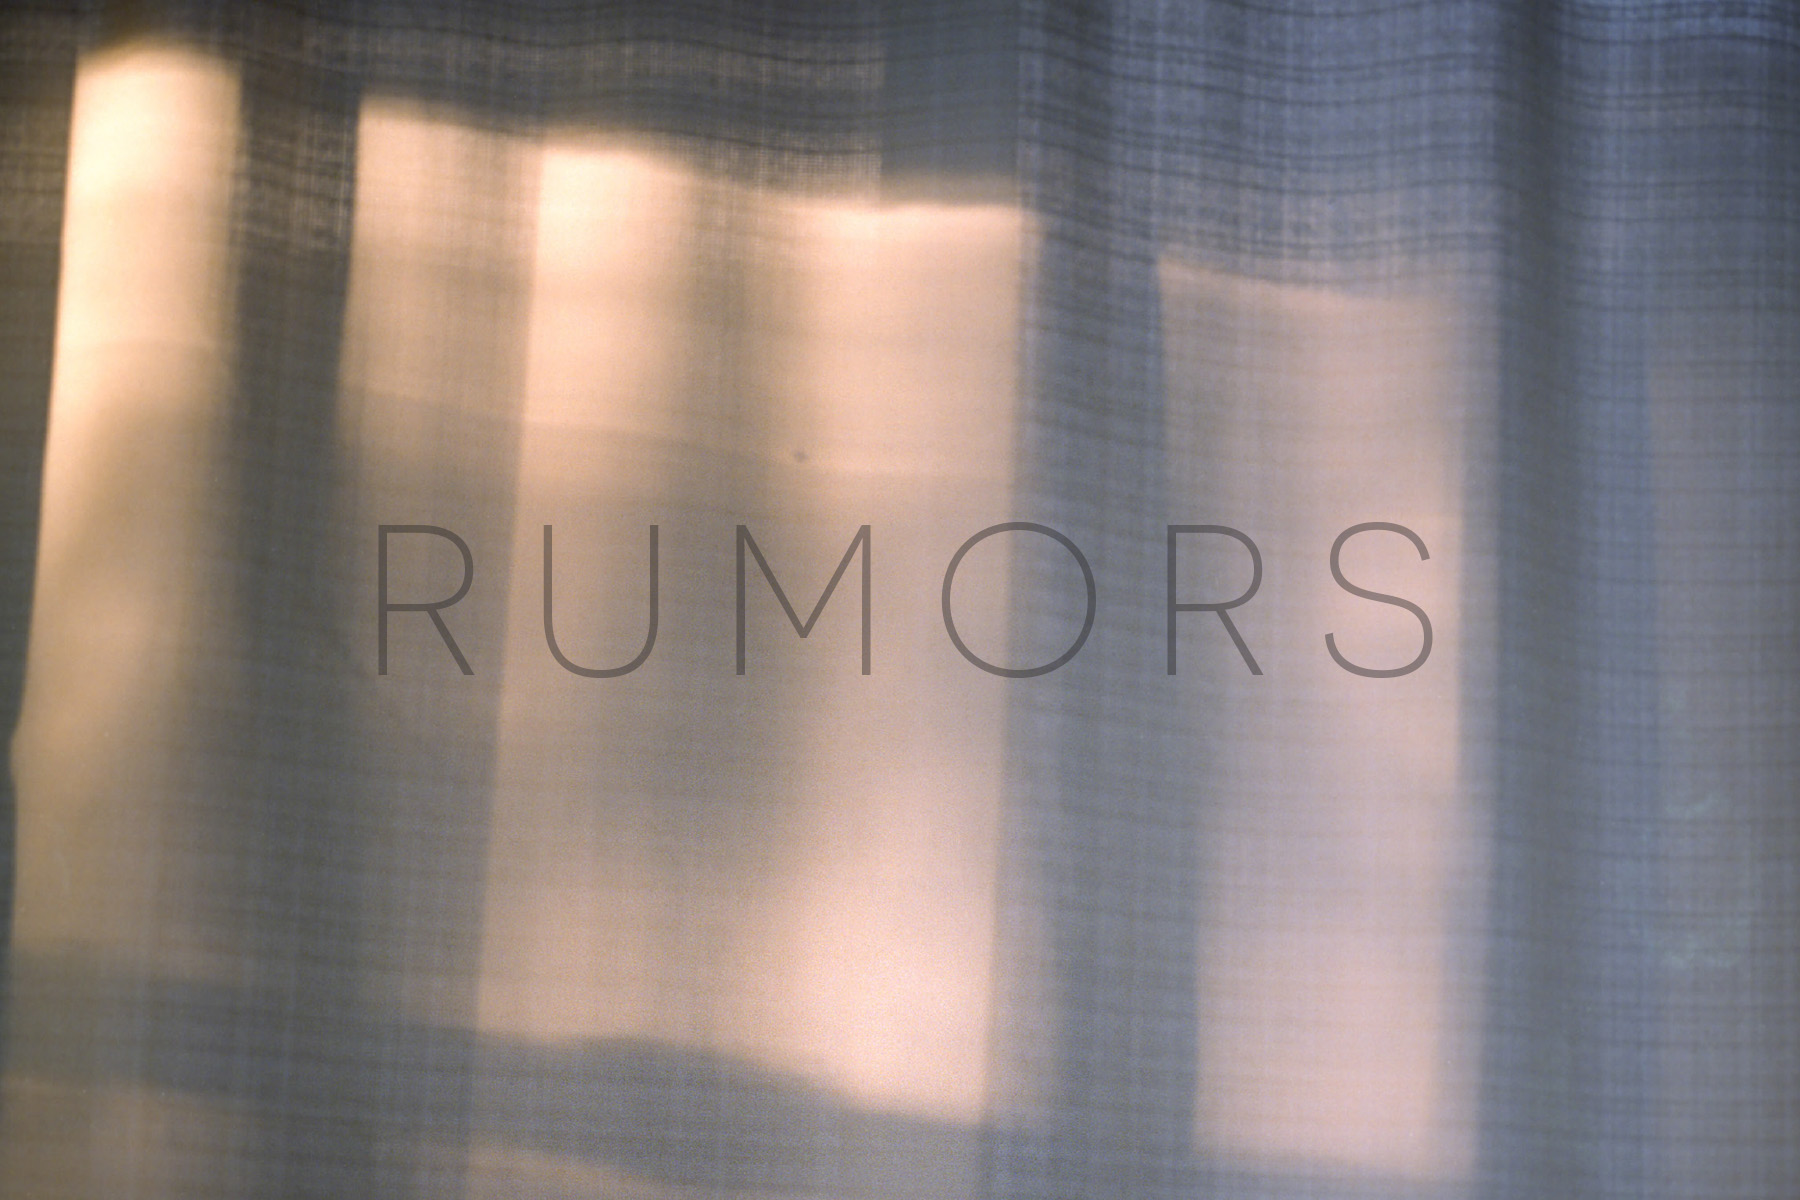 ST+Rumors+Show+Card.jpg